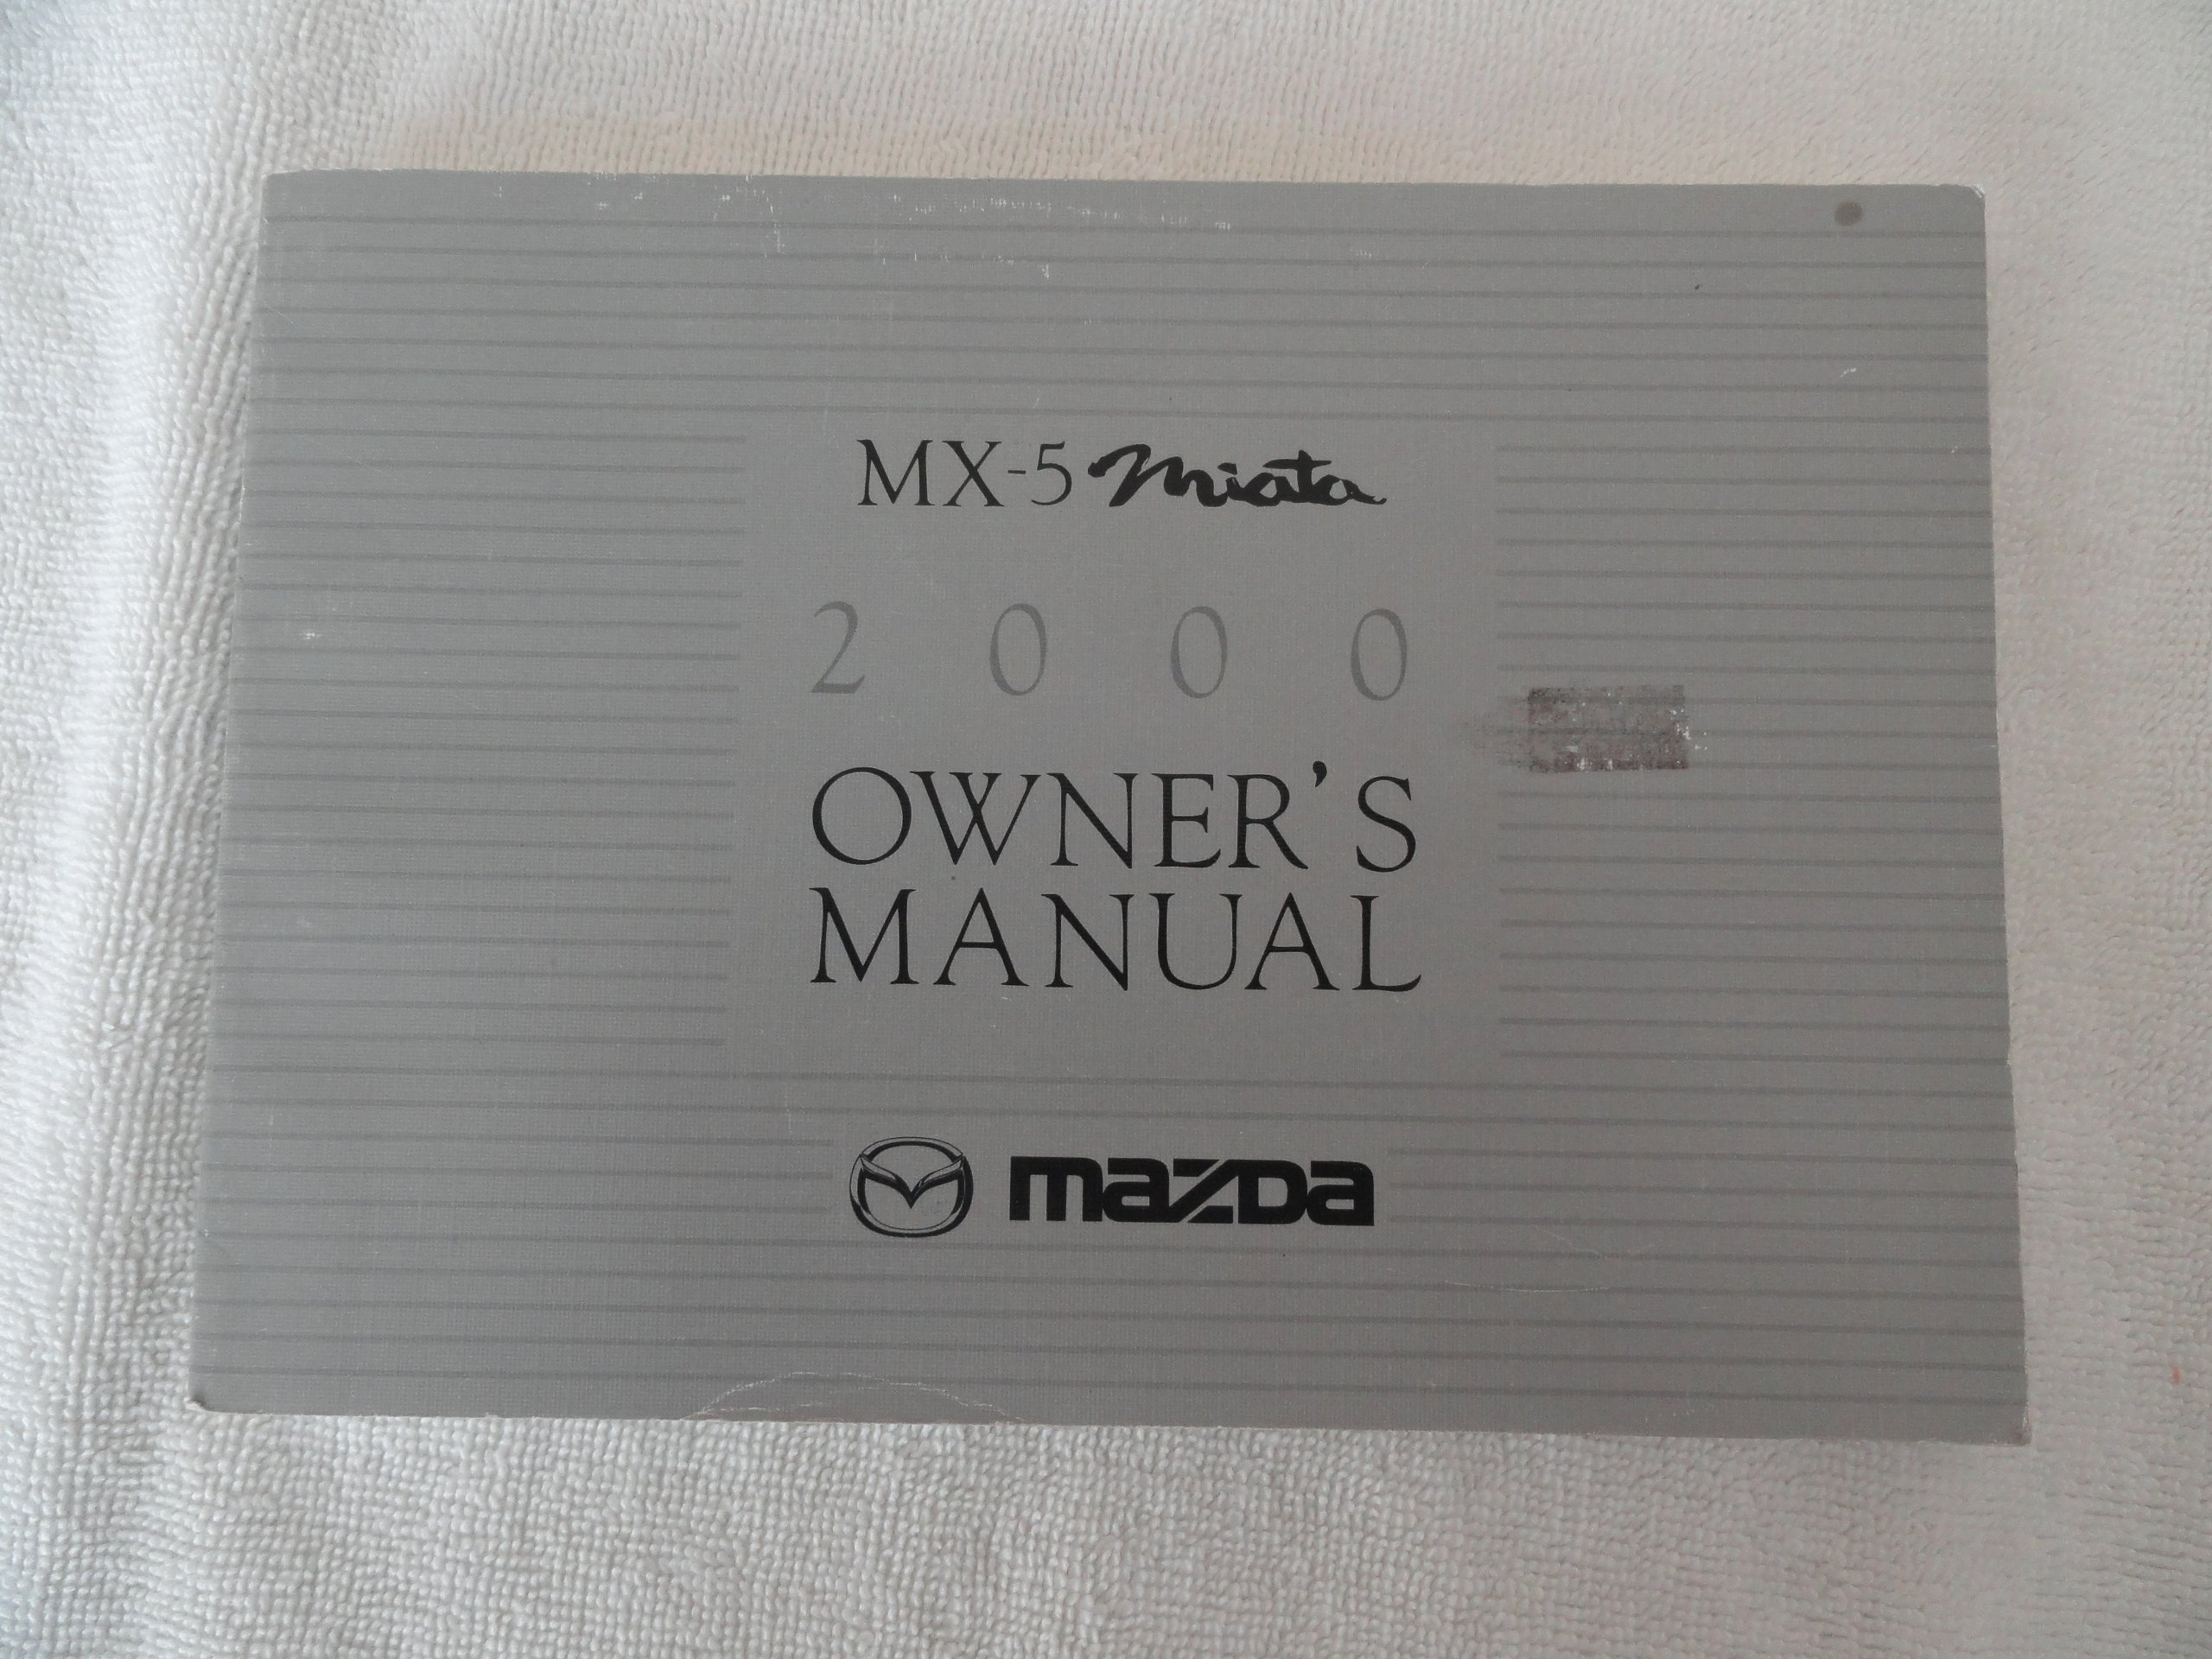 2000 mazda mx 5 miata owner s manual no case amazon com books rh amazon com 2005 Mazda Miata 2000 mazda mx-5 miata owners manual